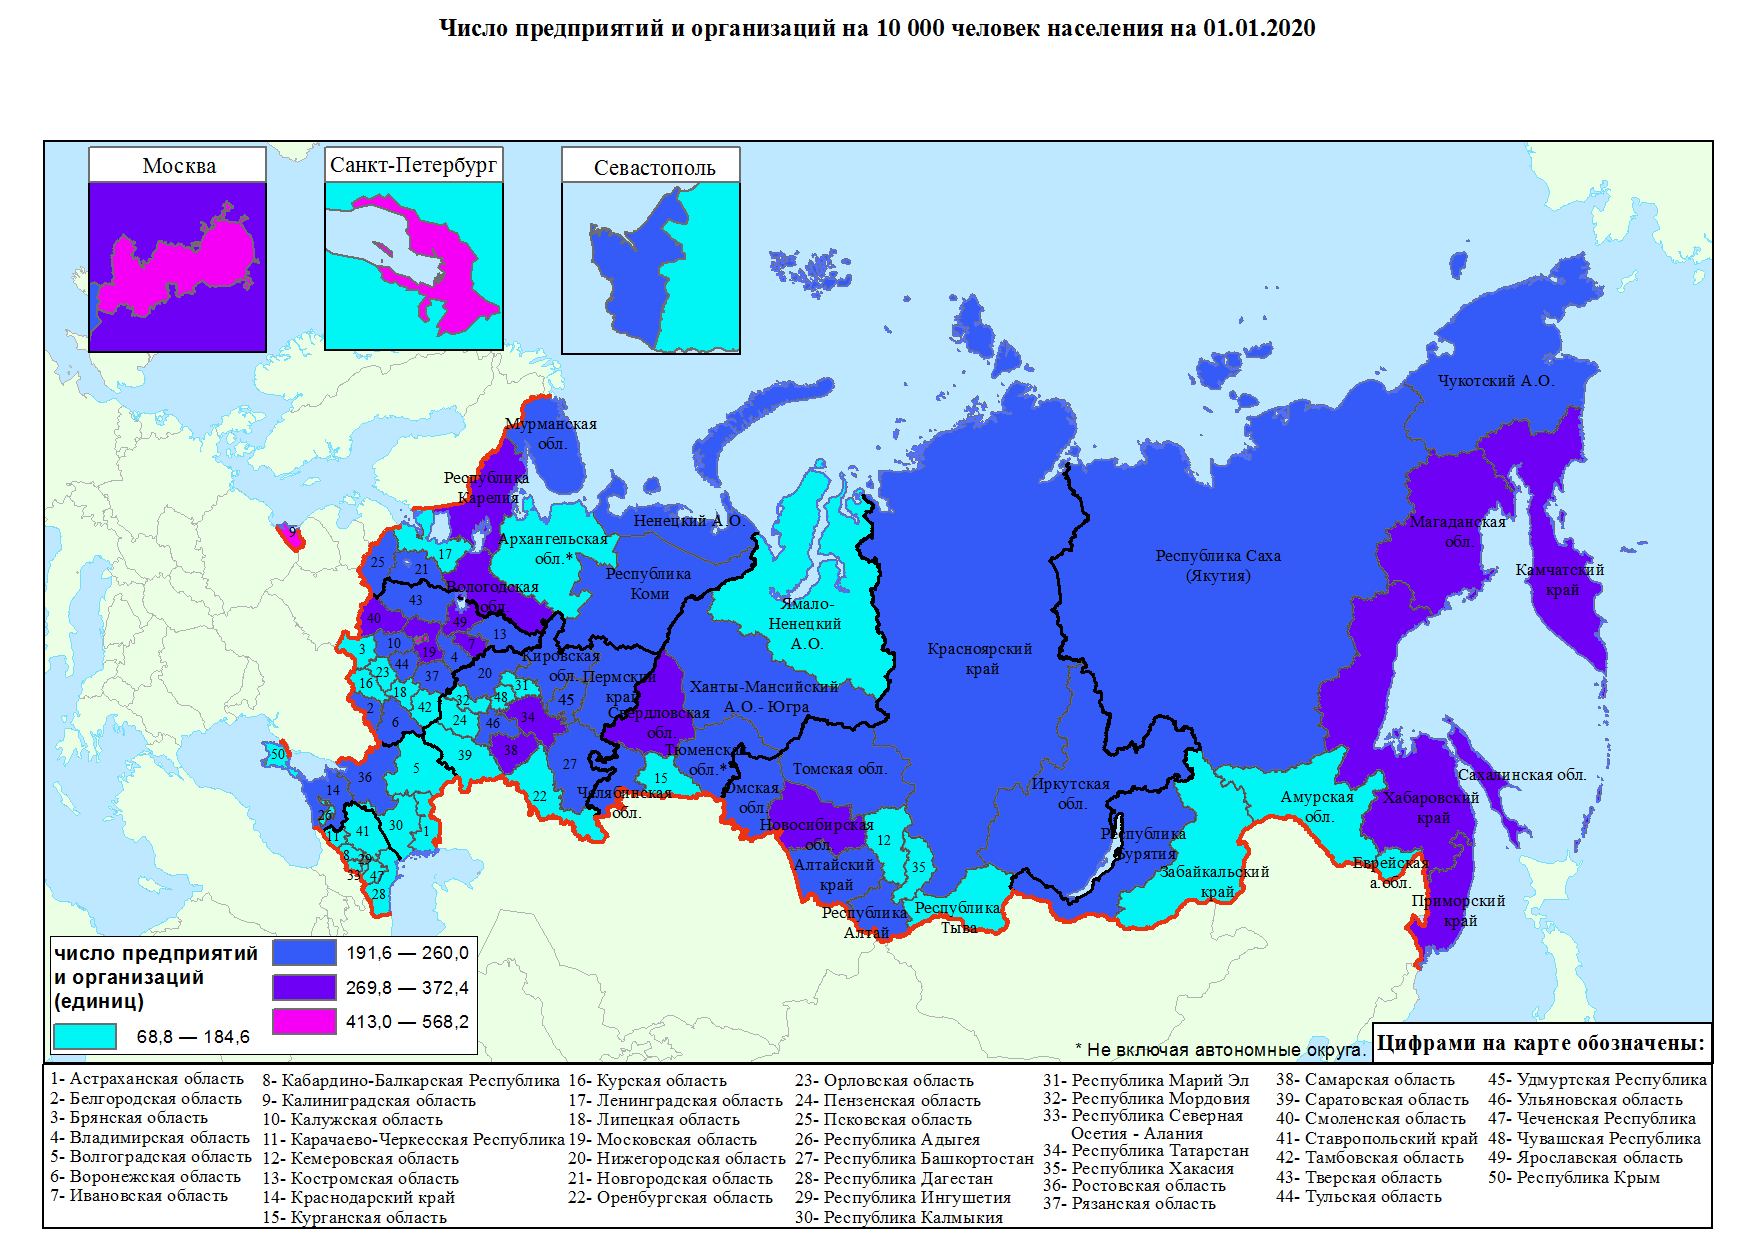 Число предприятий и организаций на 10000 человек населения на 01.01.2015